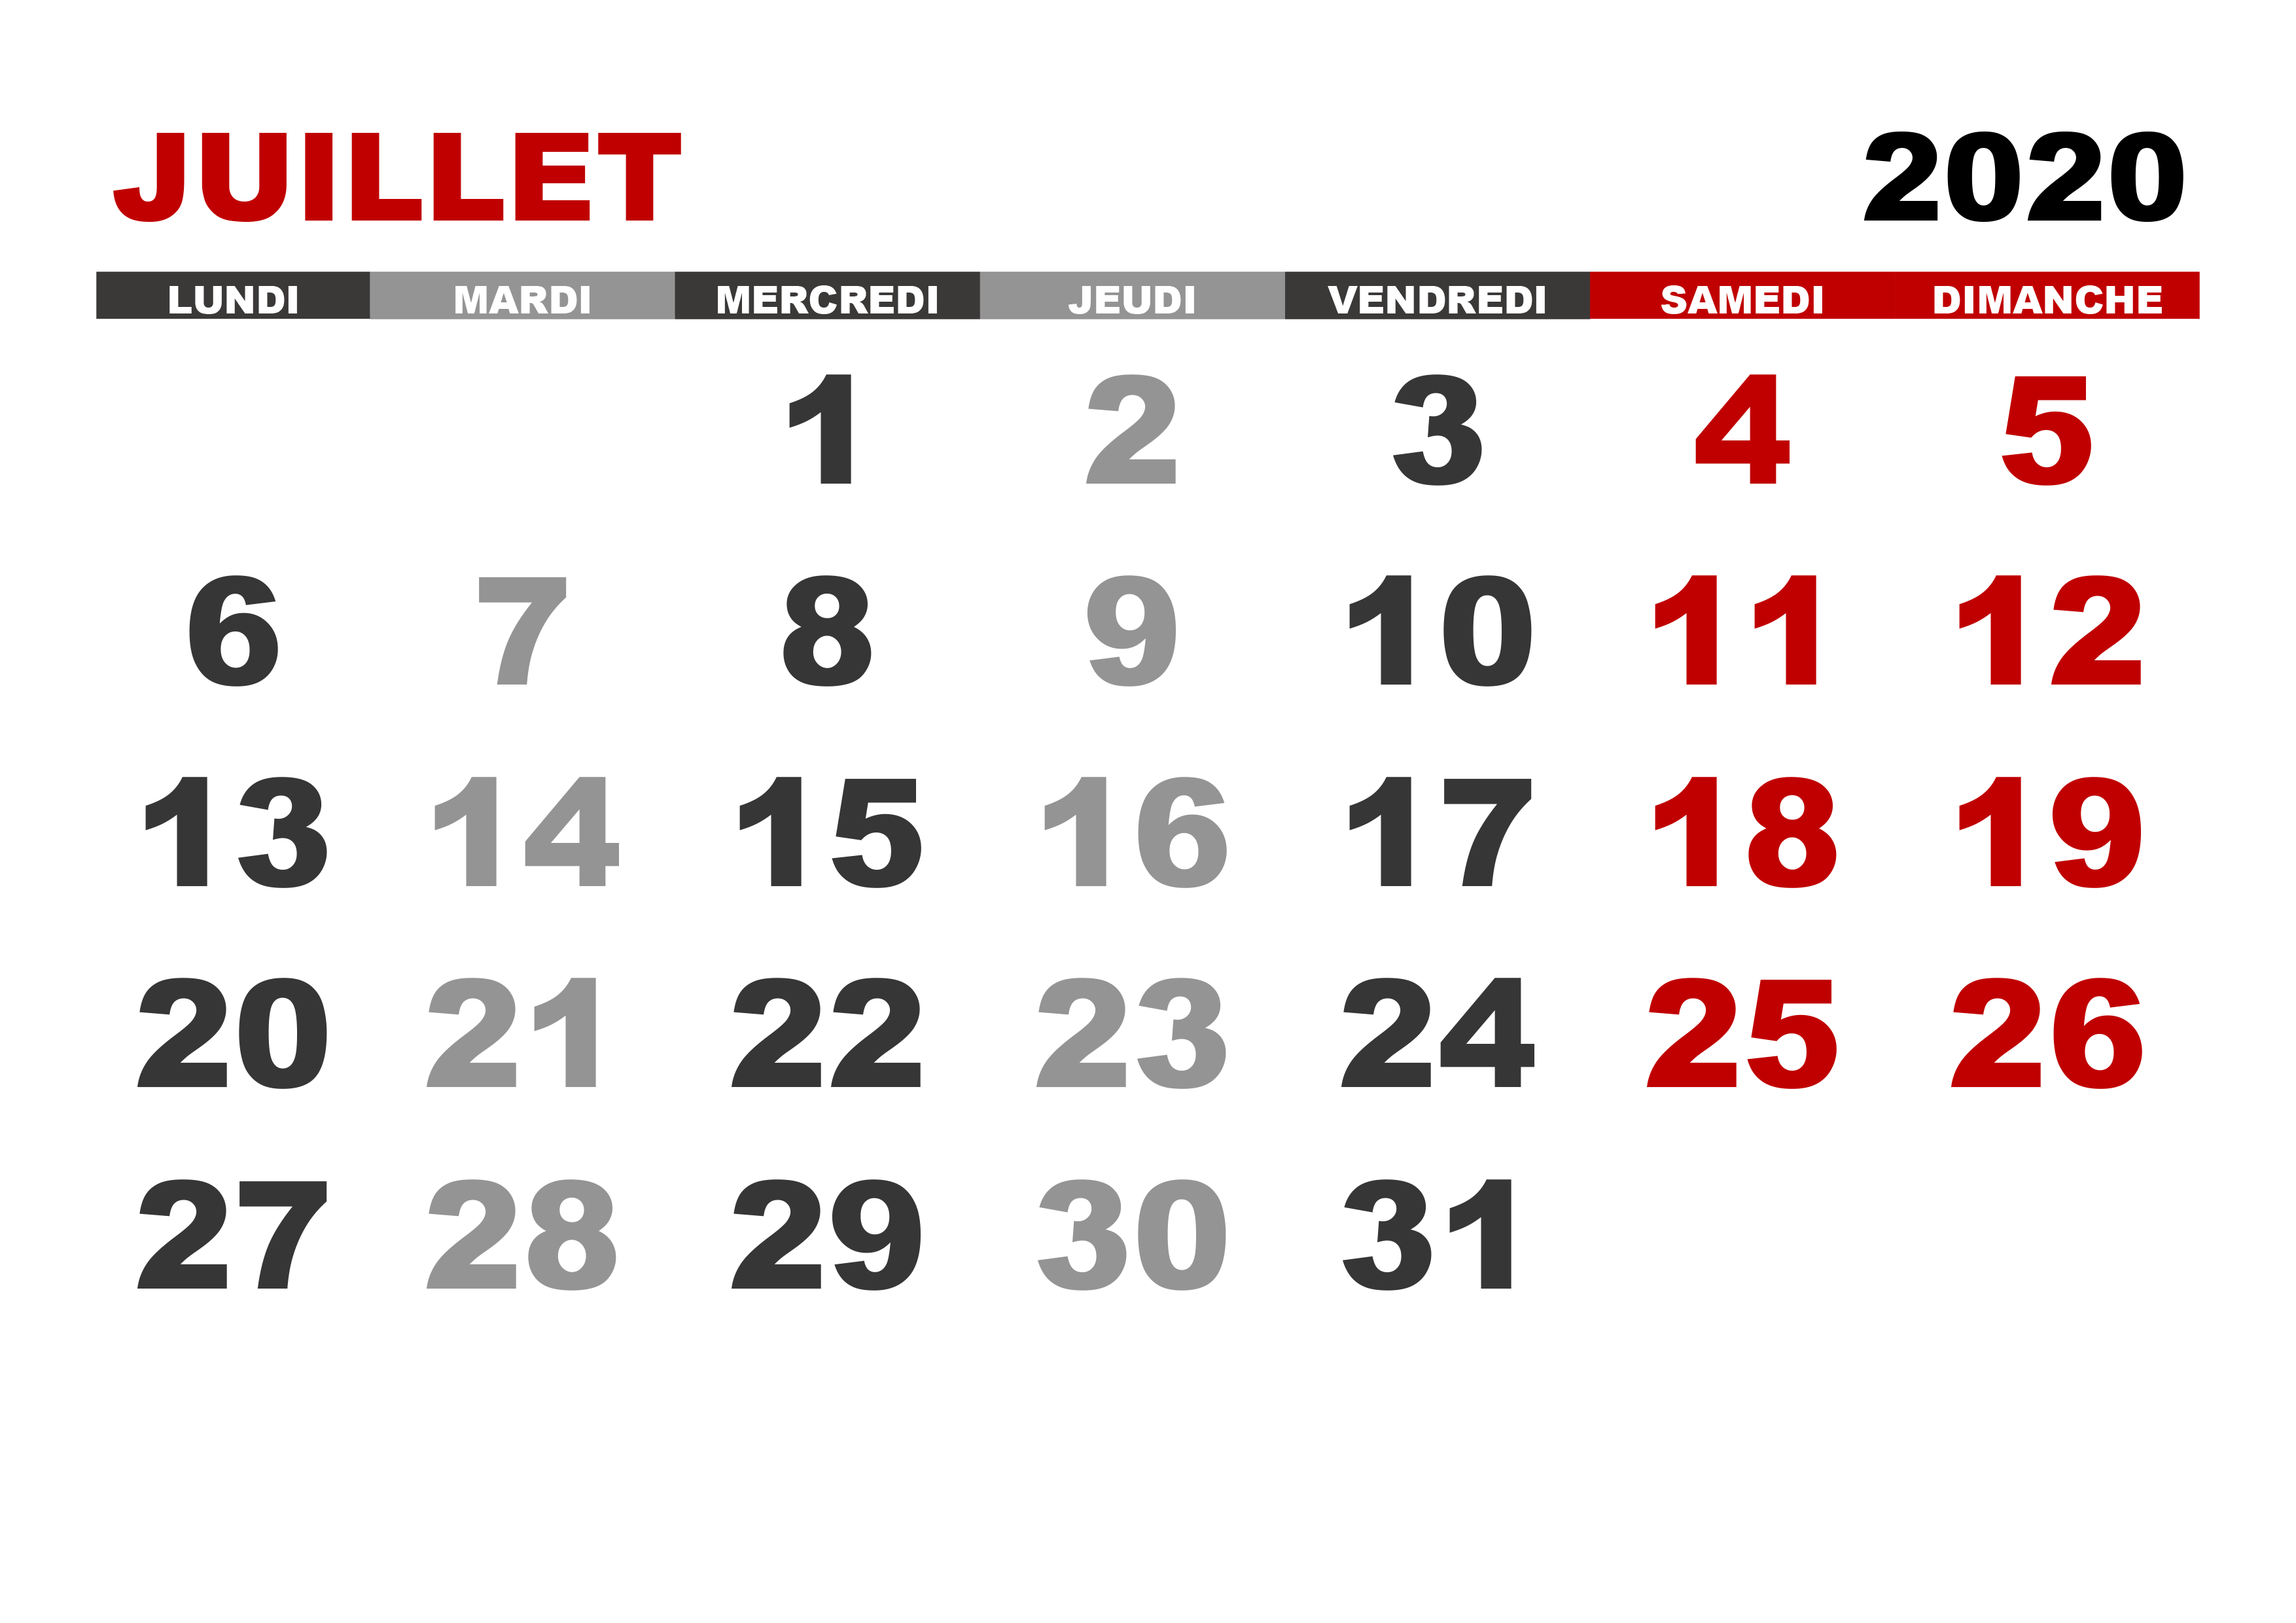 Calendrier Juillet2020.Calendrier Juillet 2020 Calendrier Su